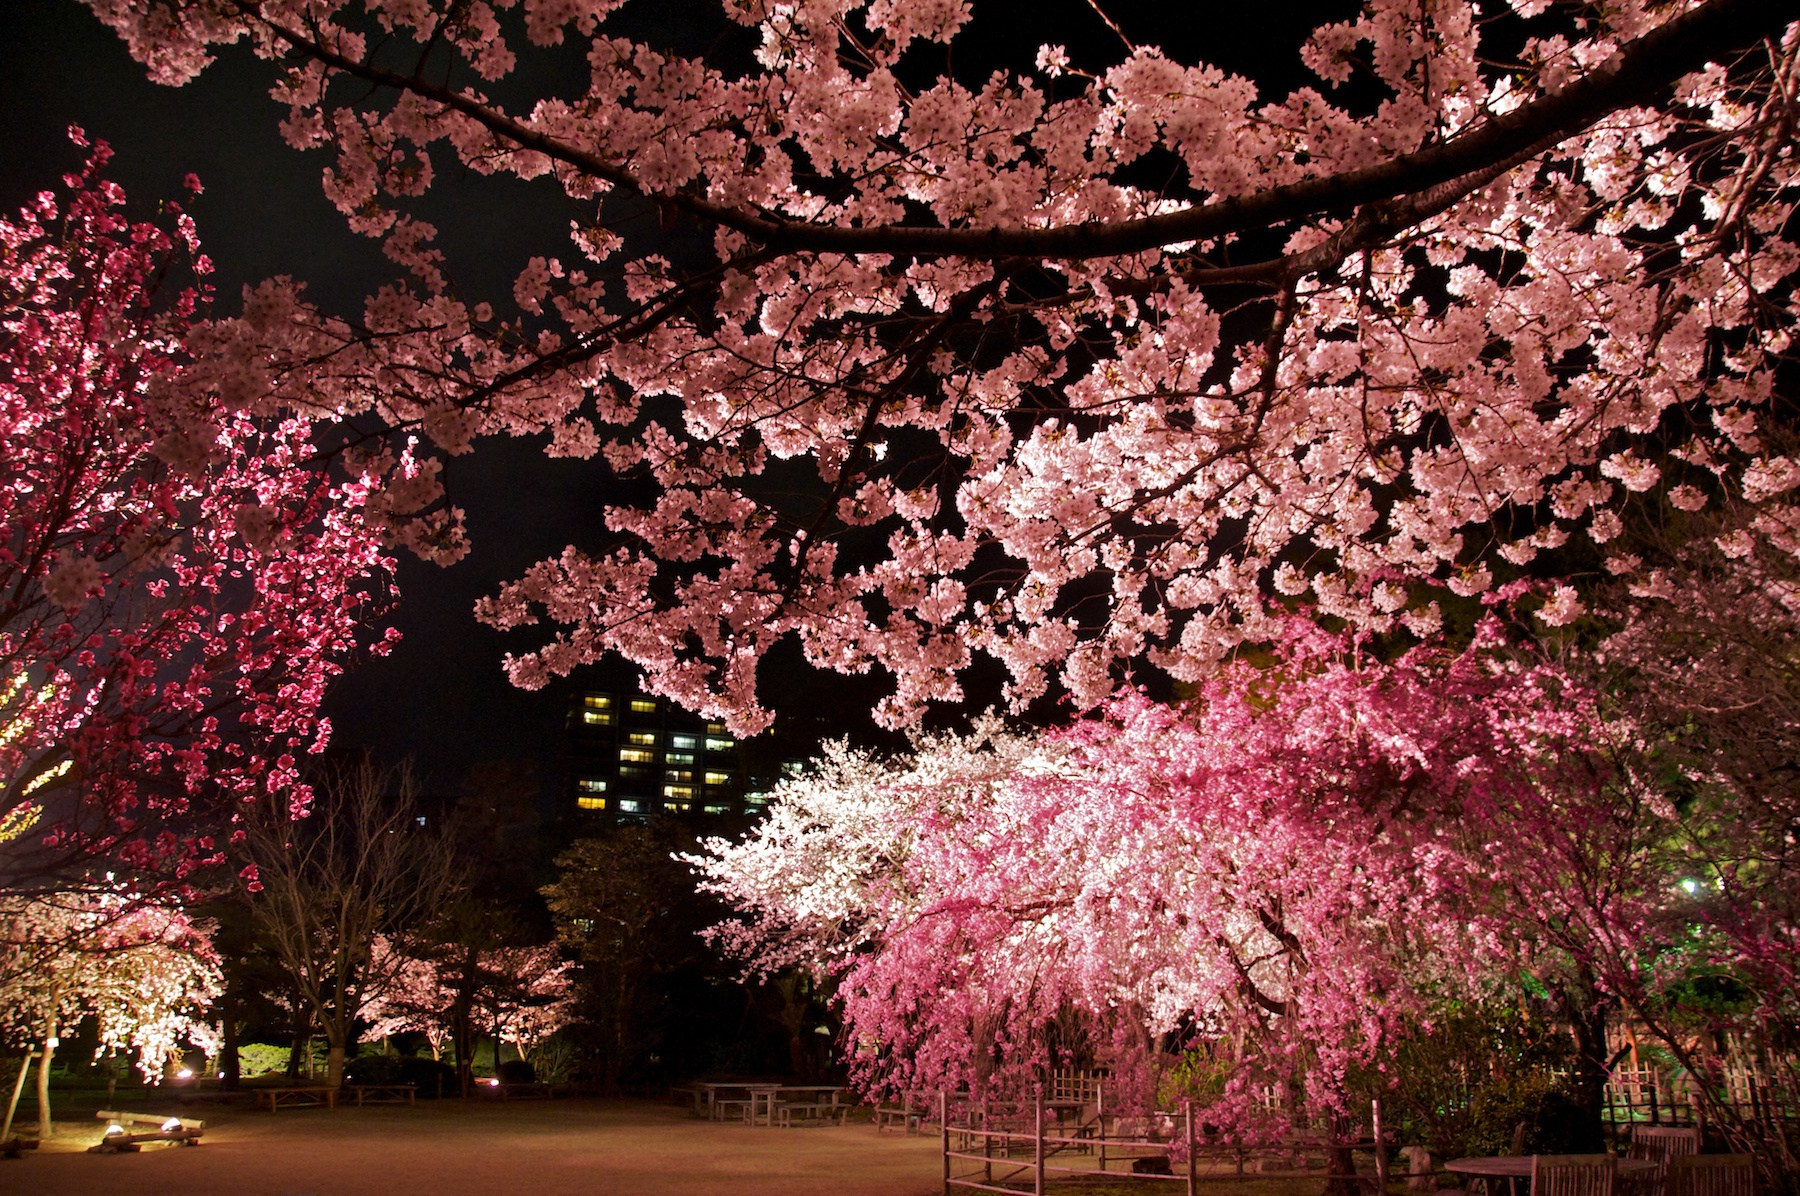 illuminated-yozakura-cherry-blossom-at-shukkei-en-garden-in-hiroshima.jpg